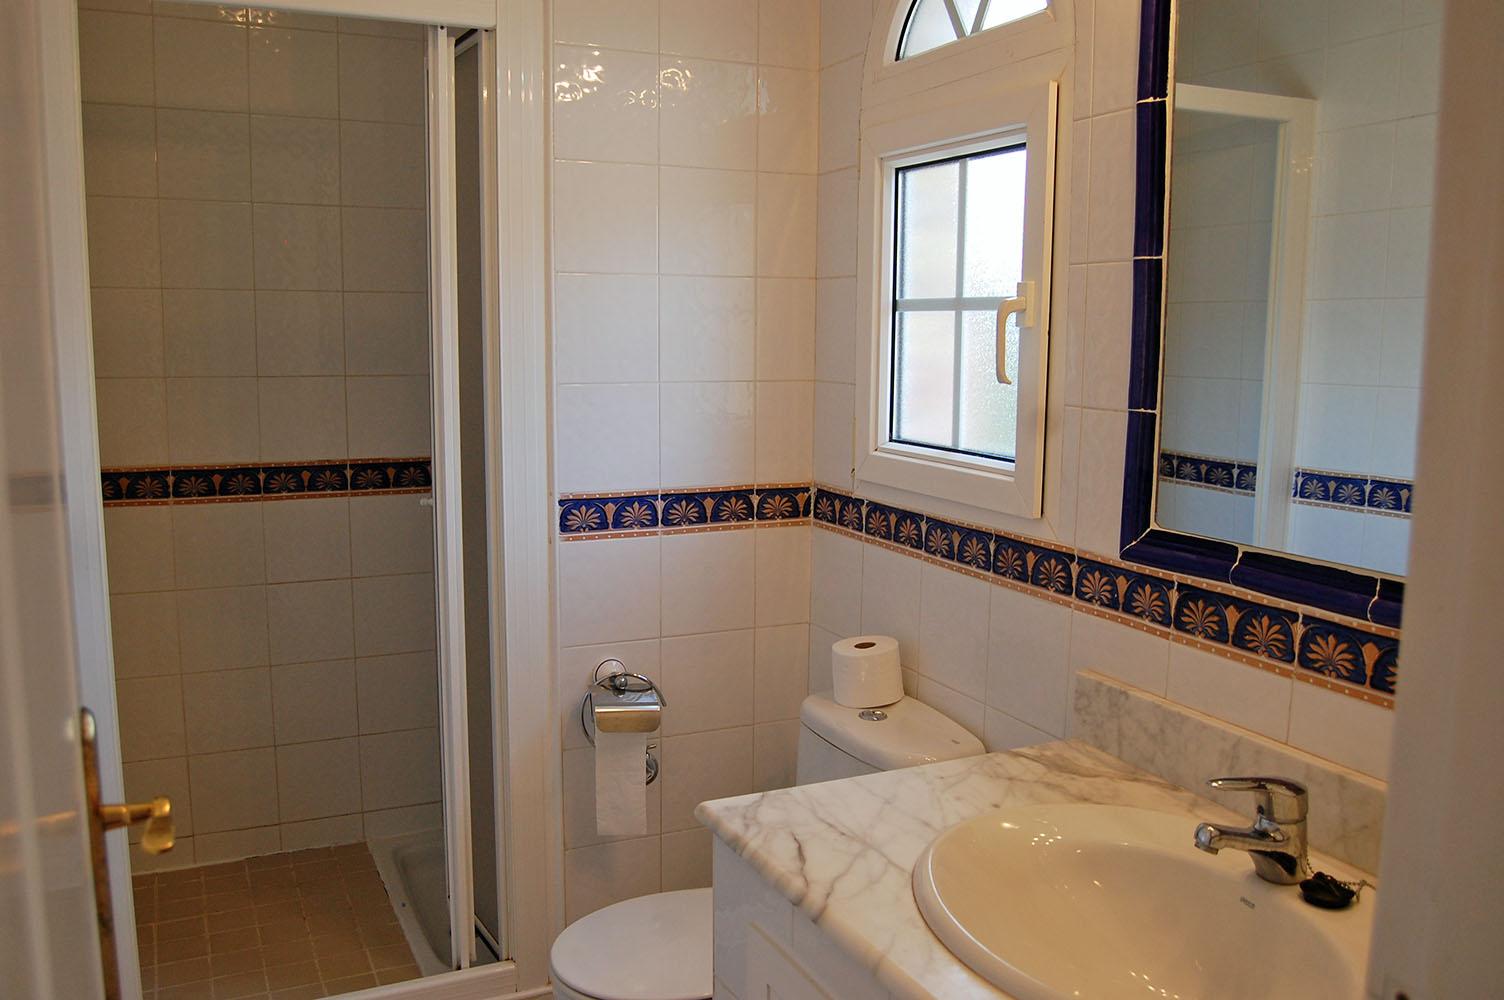 ITSH Property En suite shower room to master bedroom 11